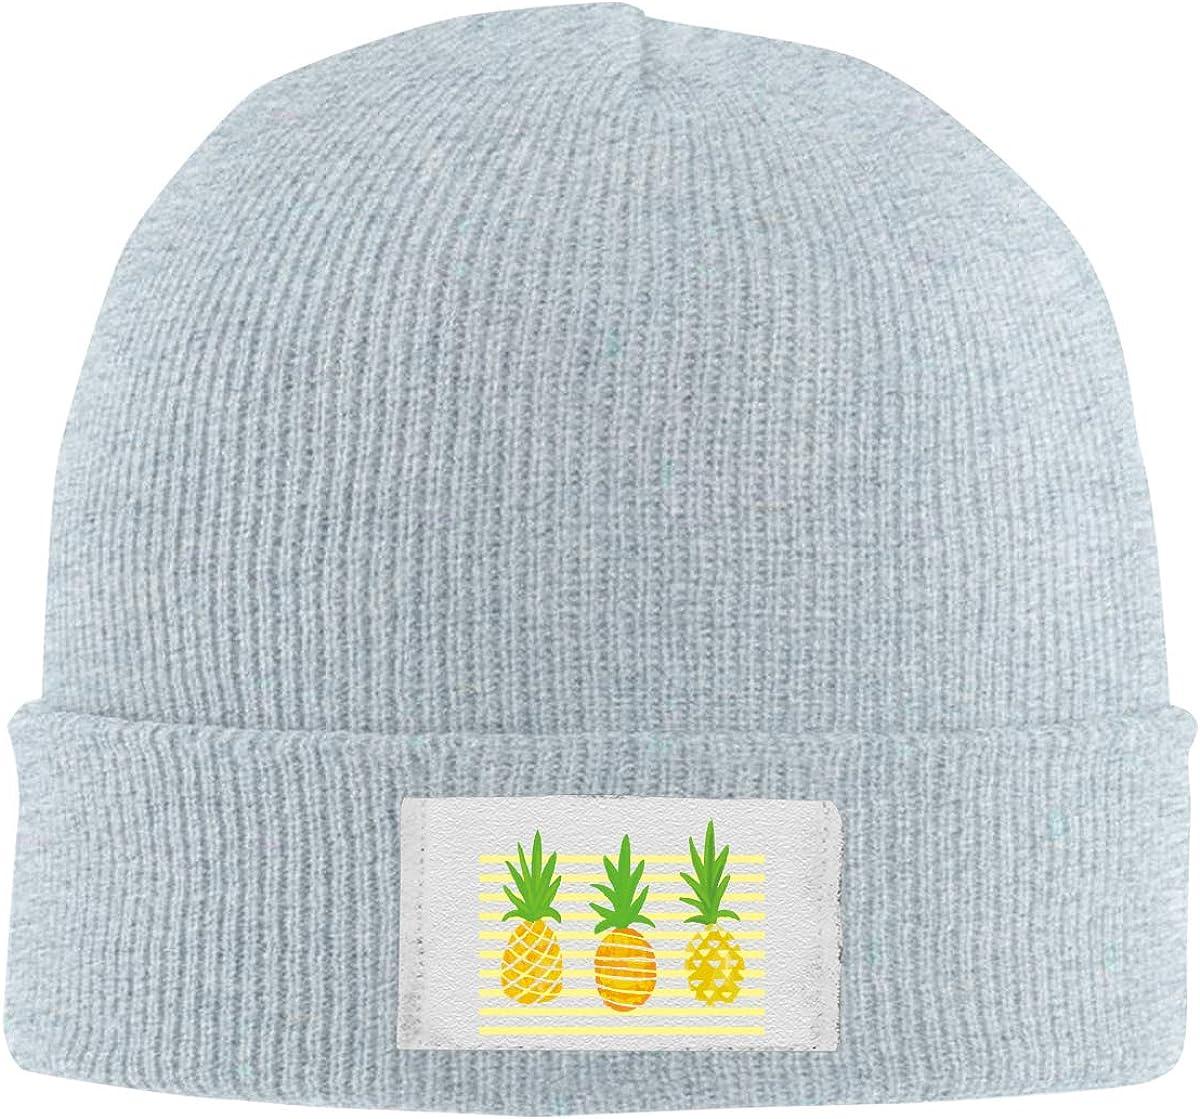 Dunpaiaa Skull Caps Abstract Pineapple Winter Warm Knit Hats Stretchy Cuff Beanie Hat Black